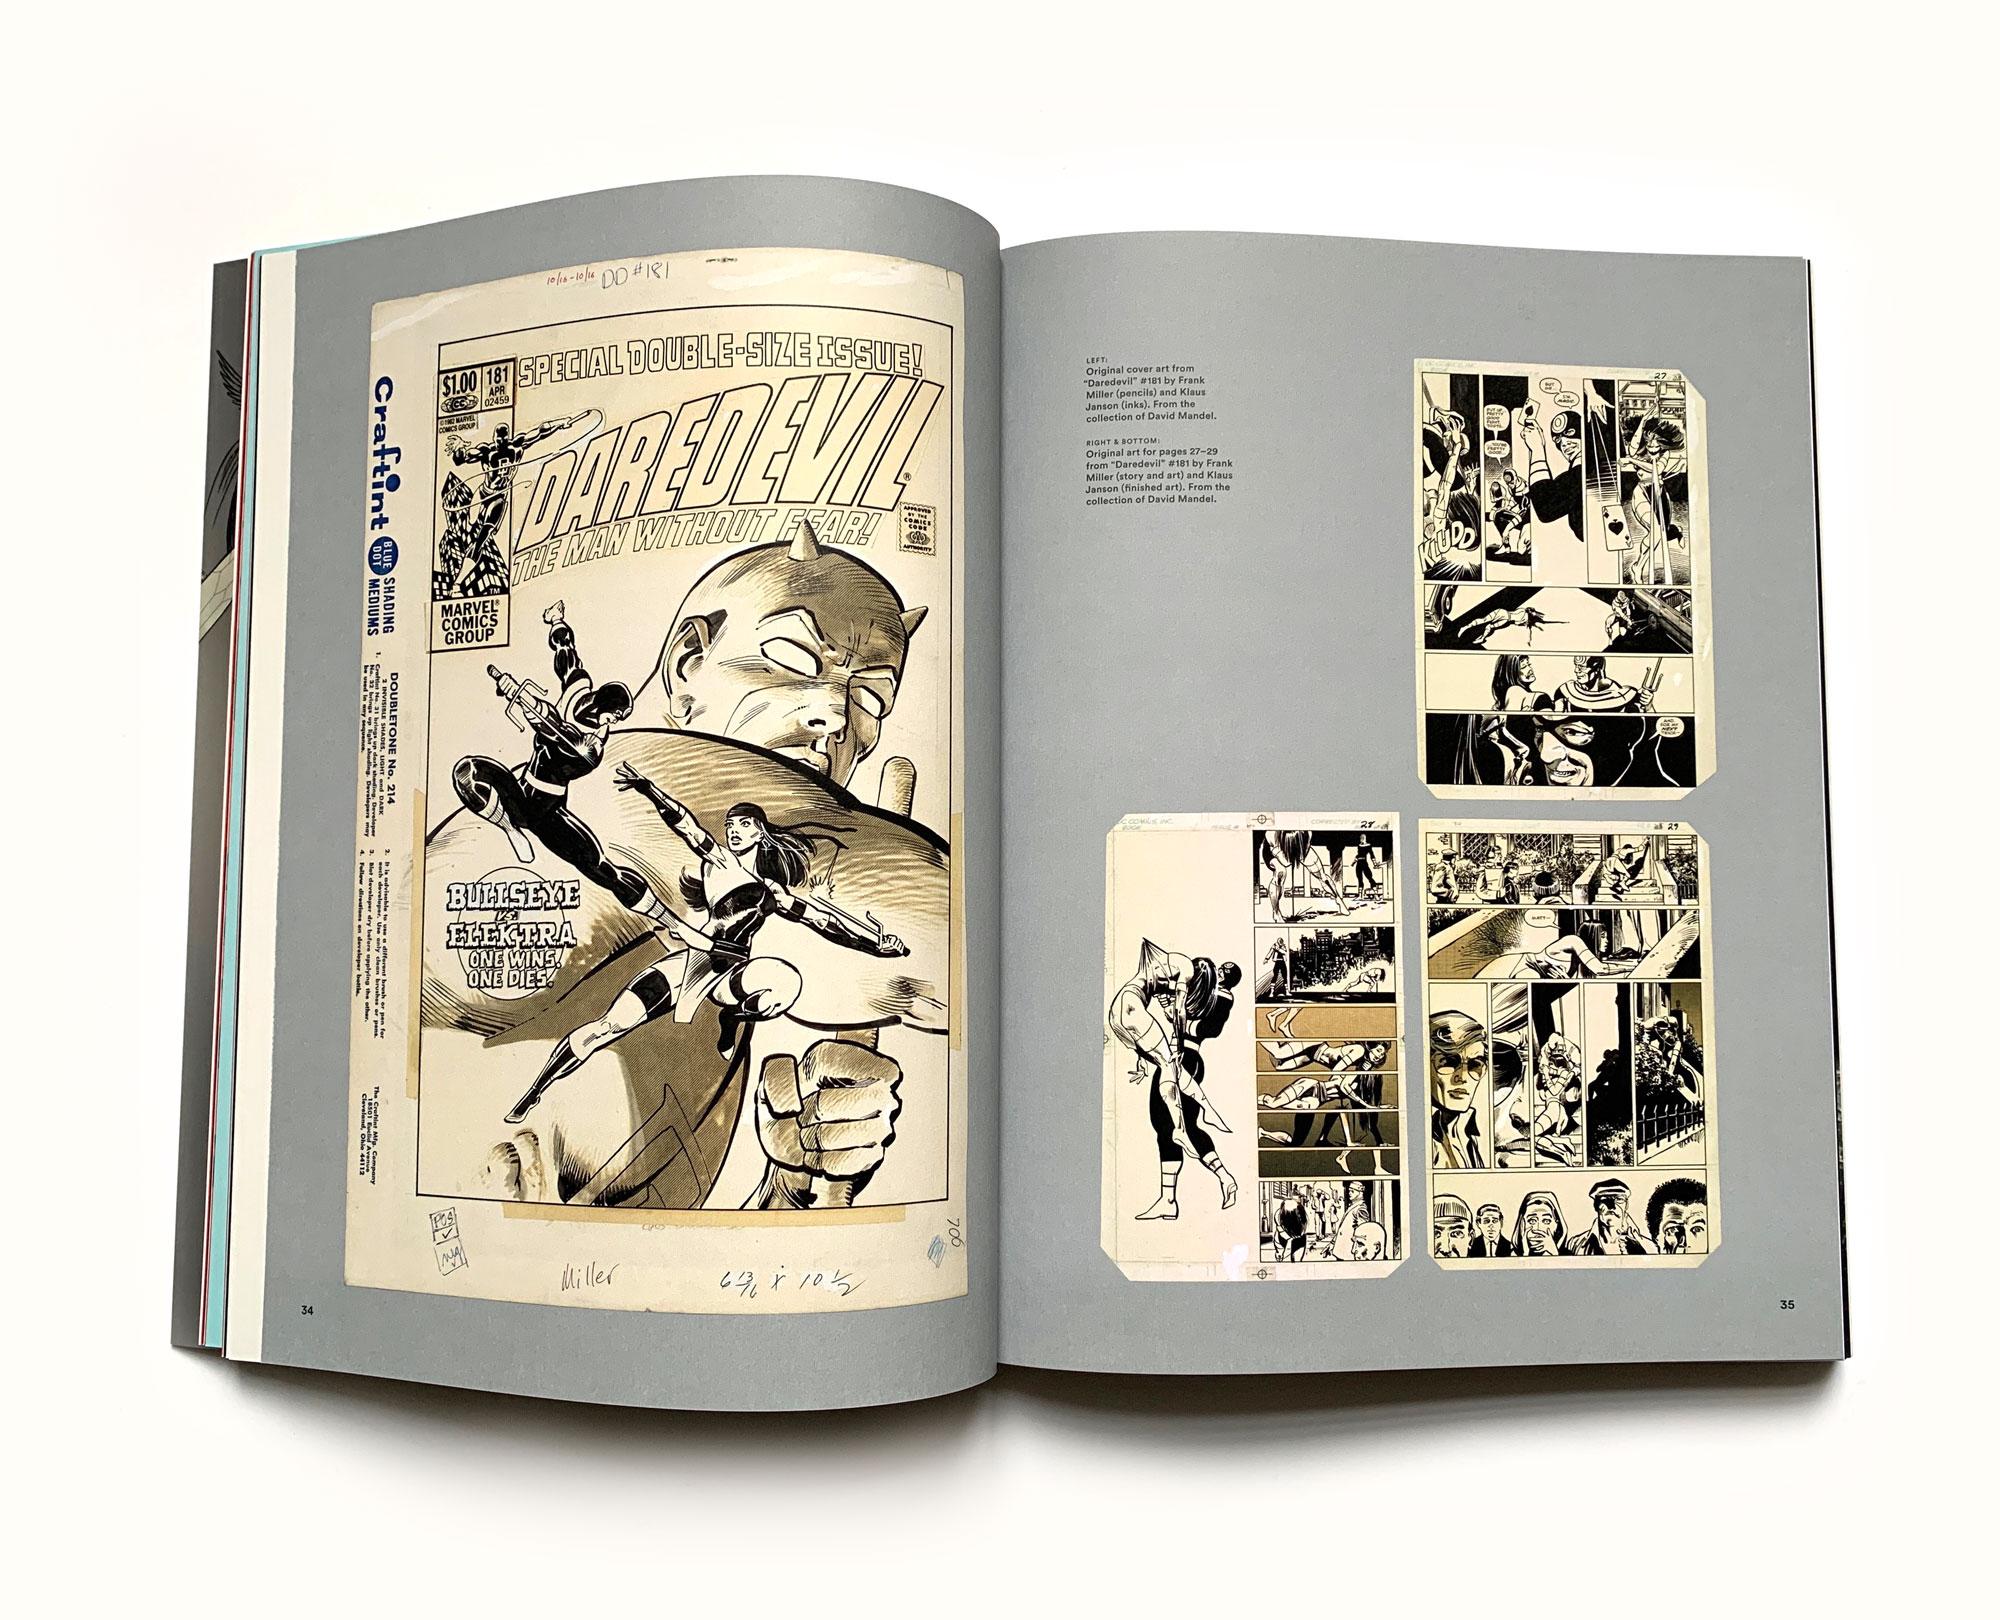 Marvel-Universe-of-Super-Heroes-Book-Balgavy-Daredevil.jpg